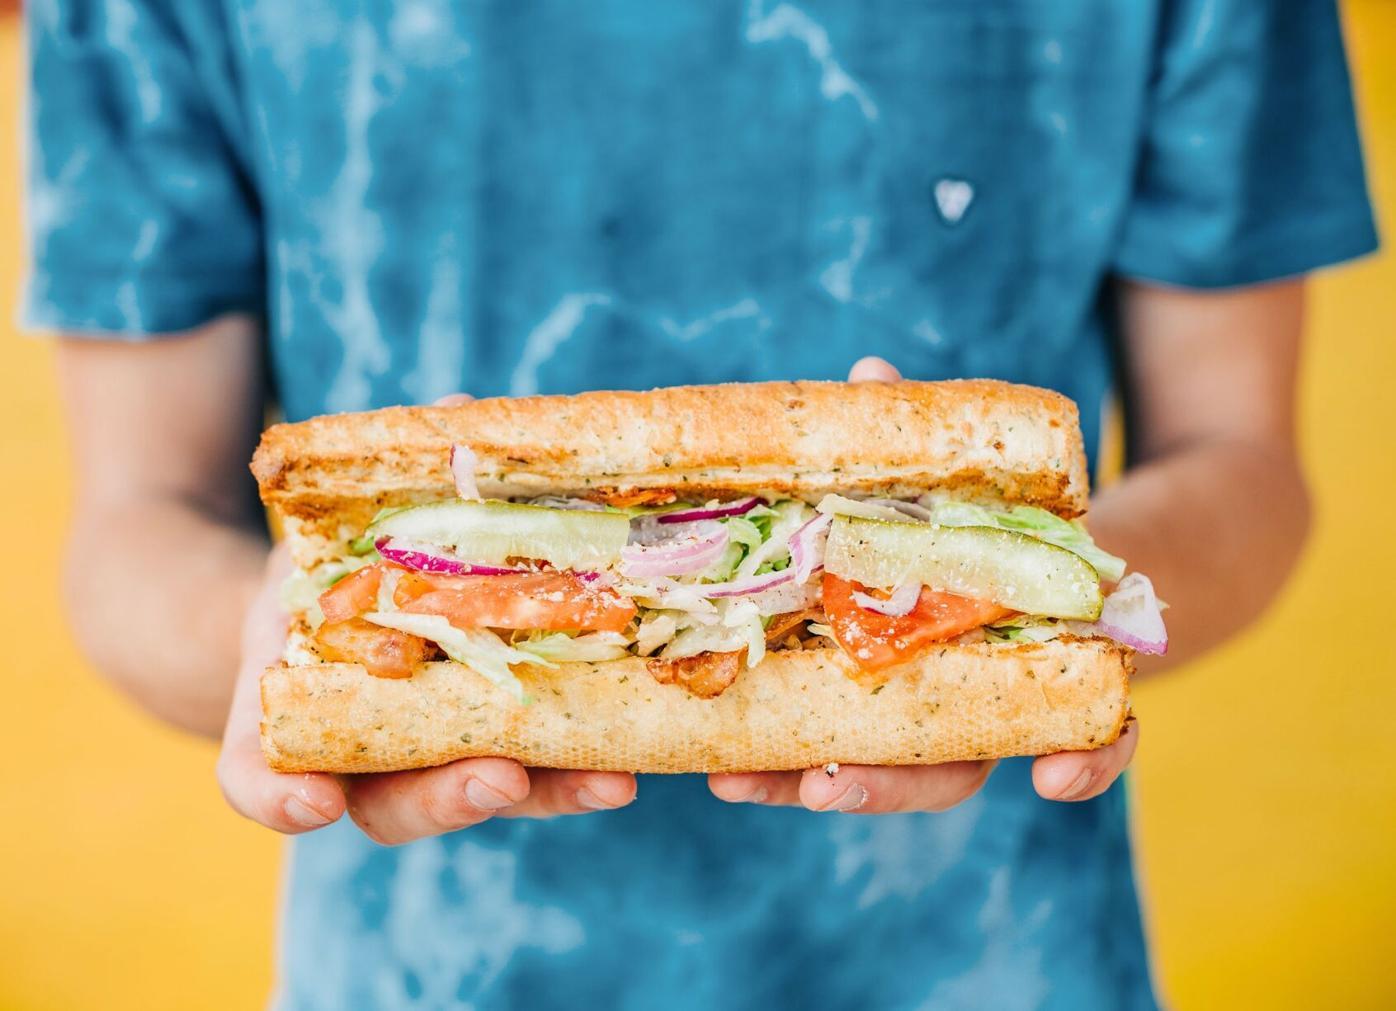 093020_MNS_Cheba_Hut_001 White Widow sandwich